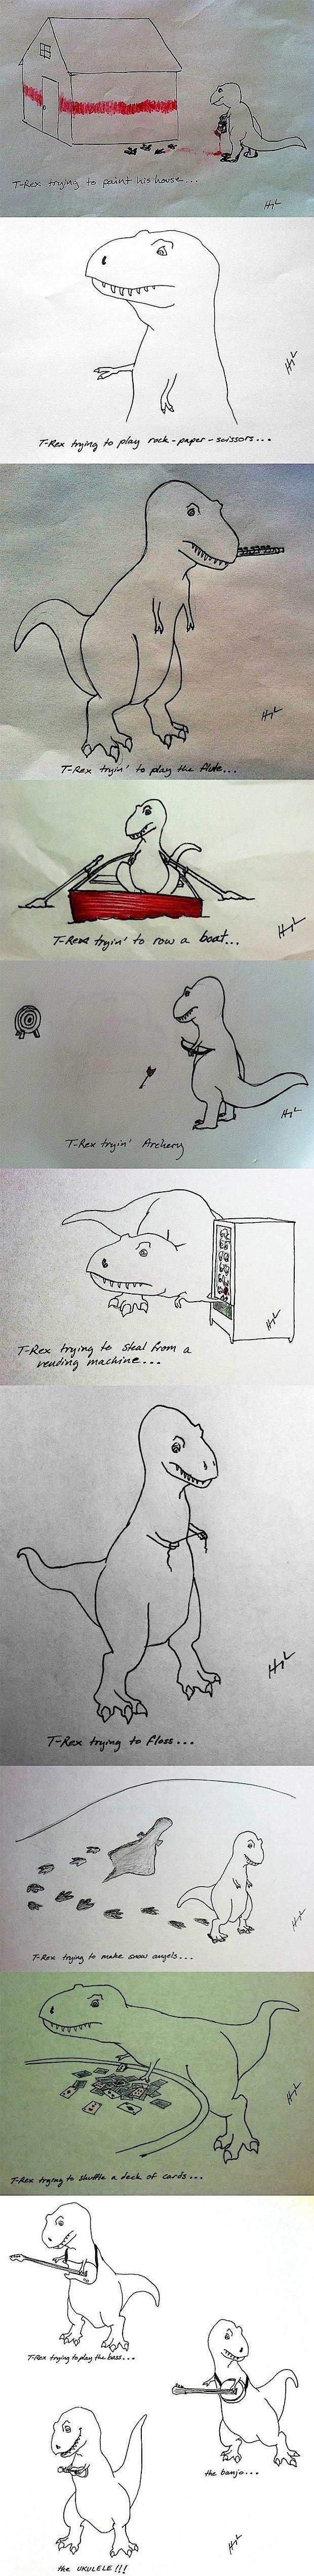 Poor T-Rex.. not anymore!